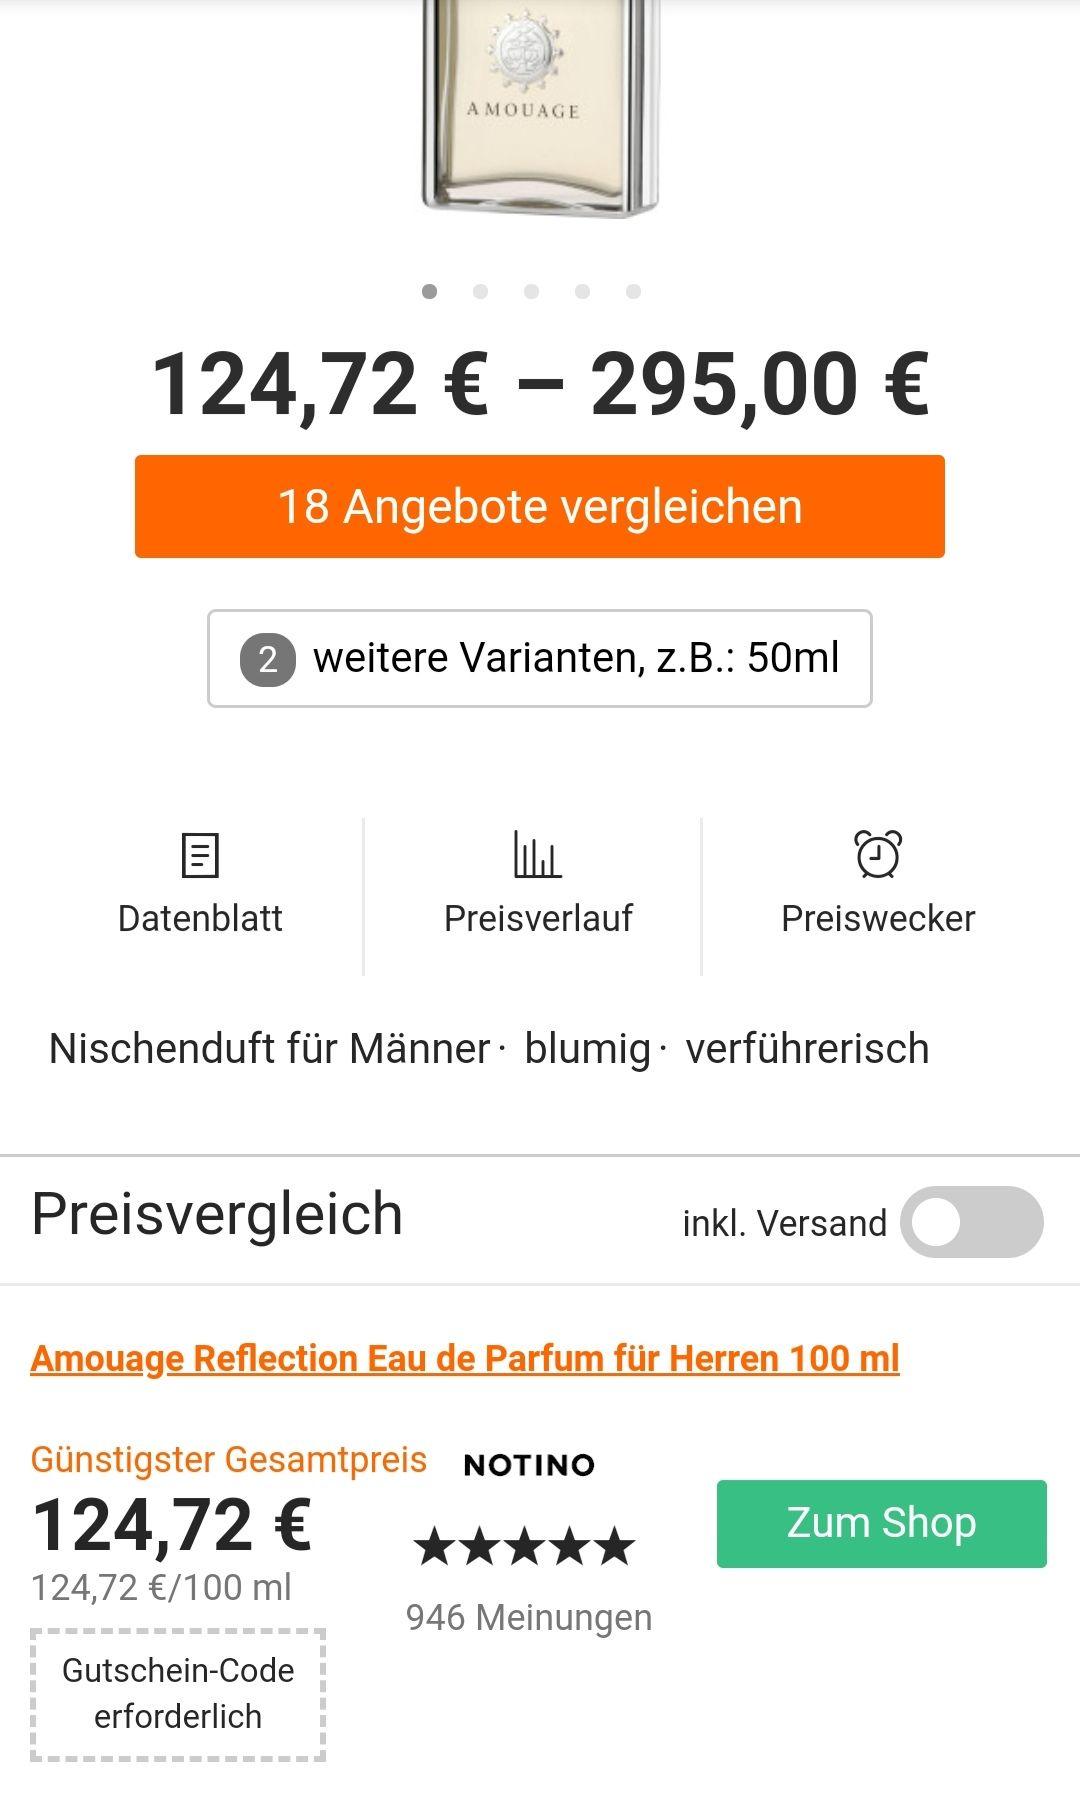 Amouage Reflection Man 100ml 124,72€